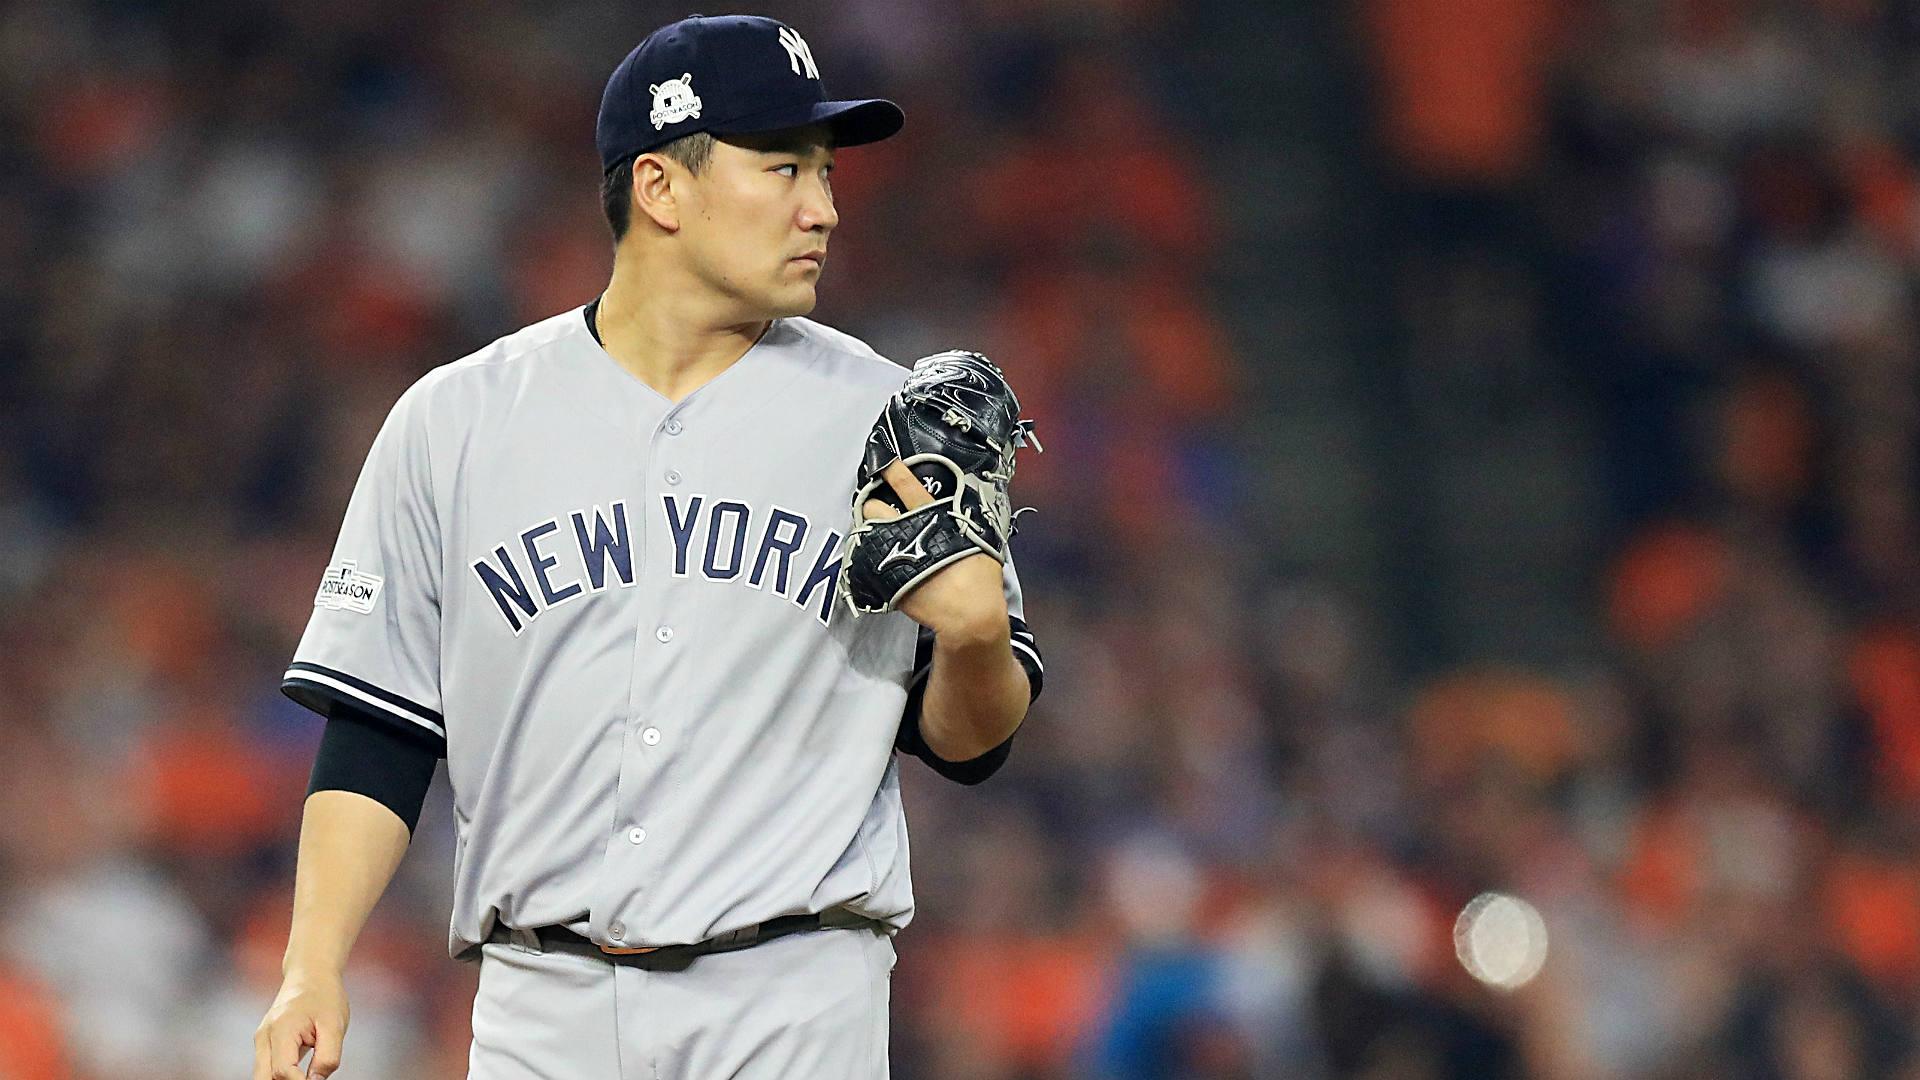 Yankees Tanaka